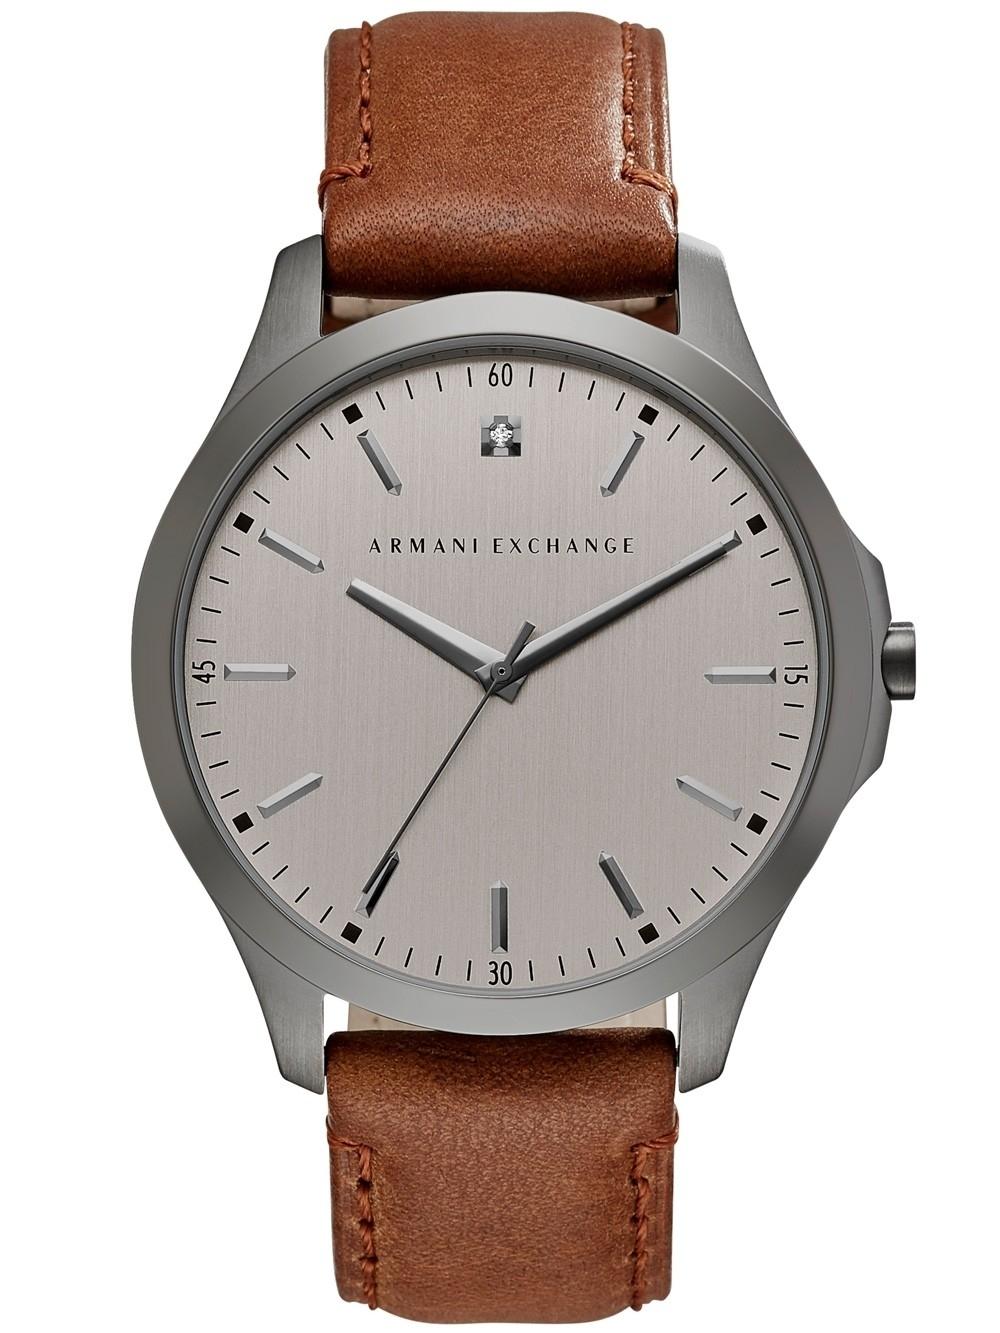 Hampton RelojesChrono12 5atm Ax2195 Exchange Herren Armani 46mm FKJlcuT13